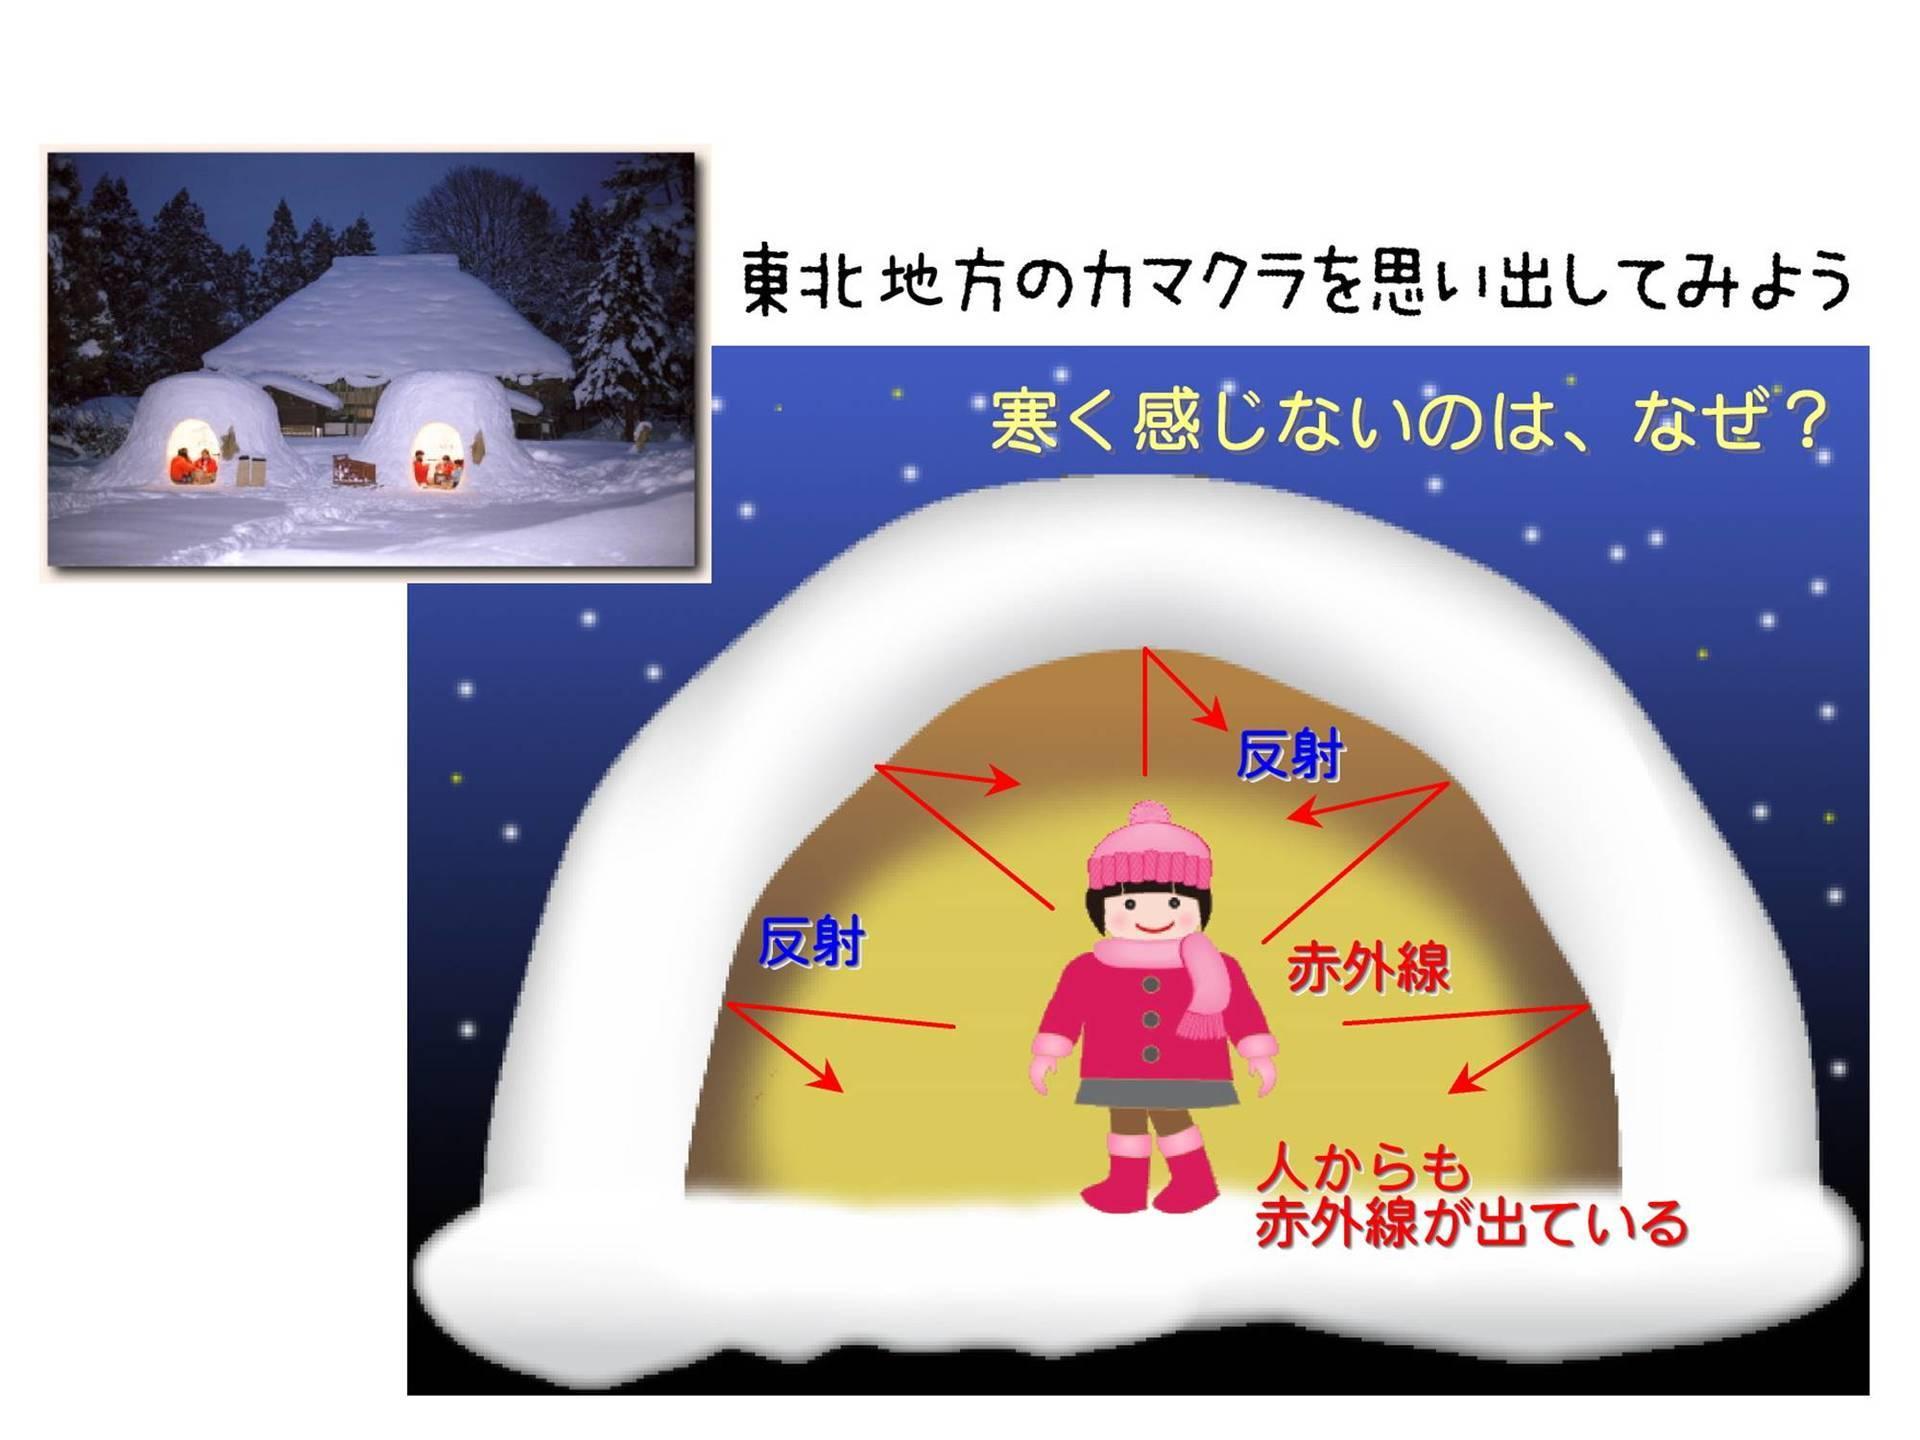 Sスライド36.JPG